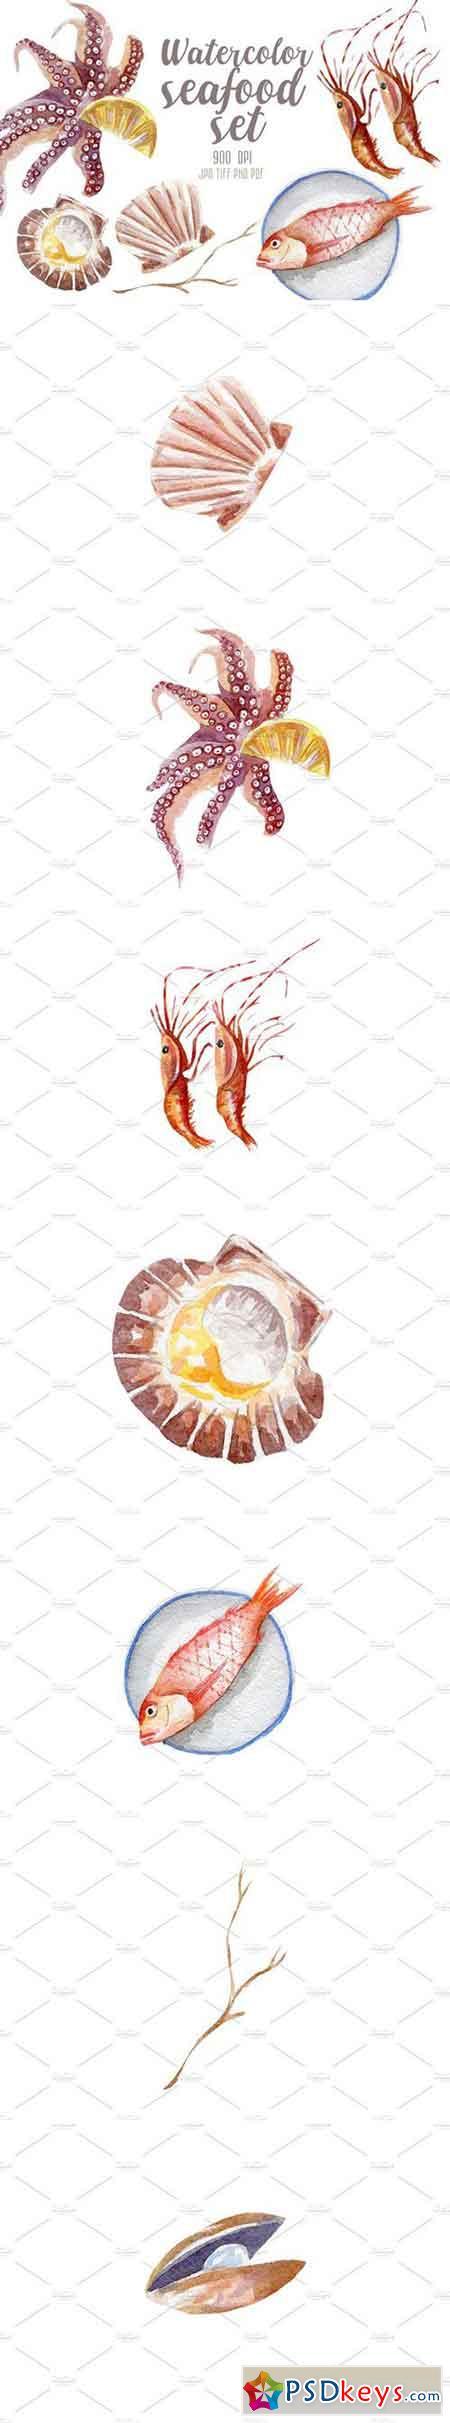 Watercolor seafood set 2230829